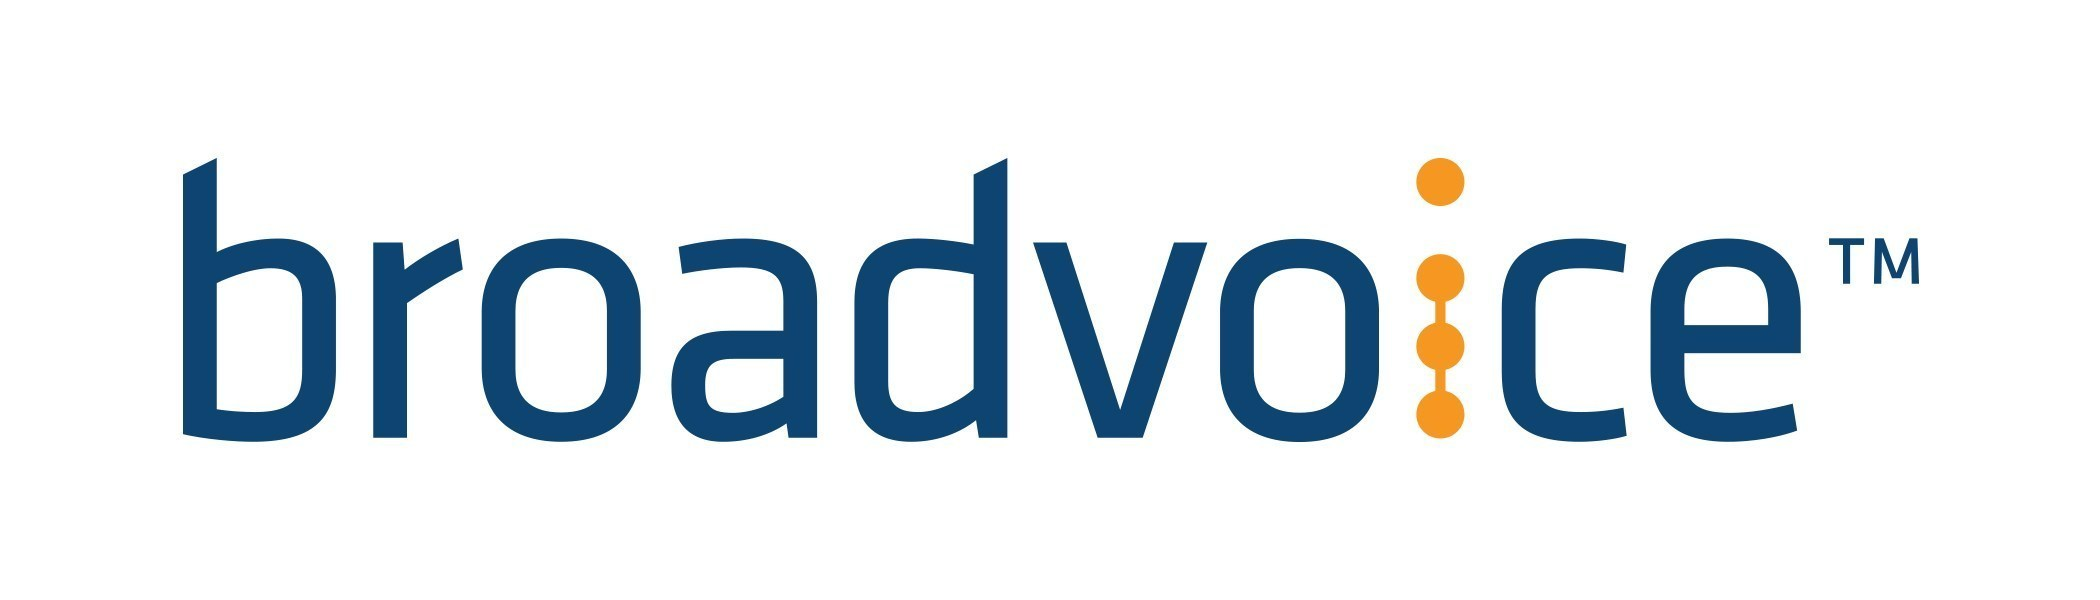 Broadvoice-logo.jpg